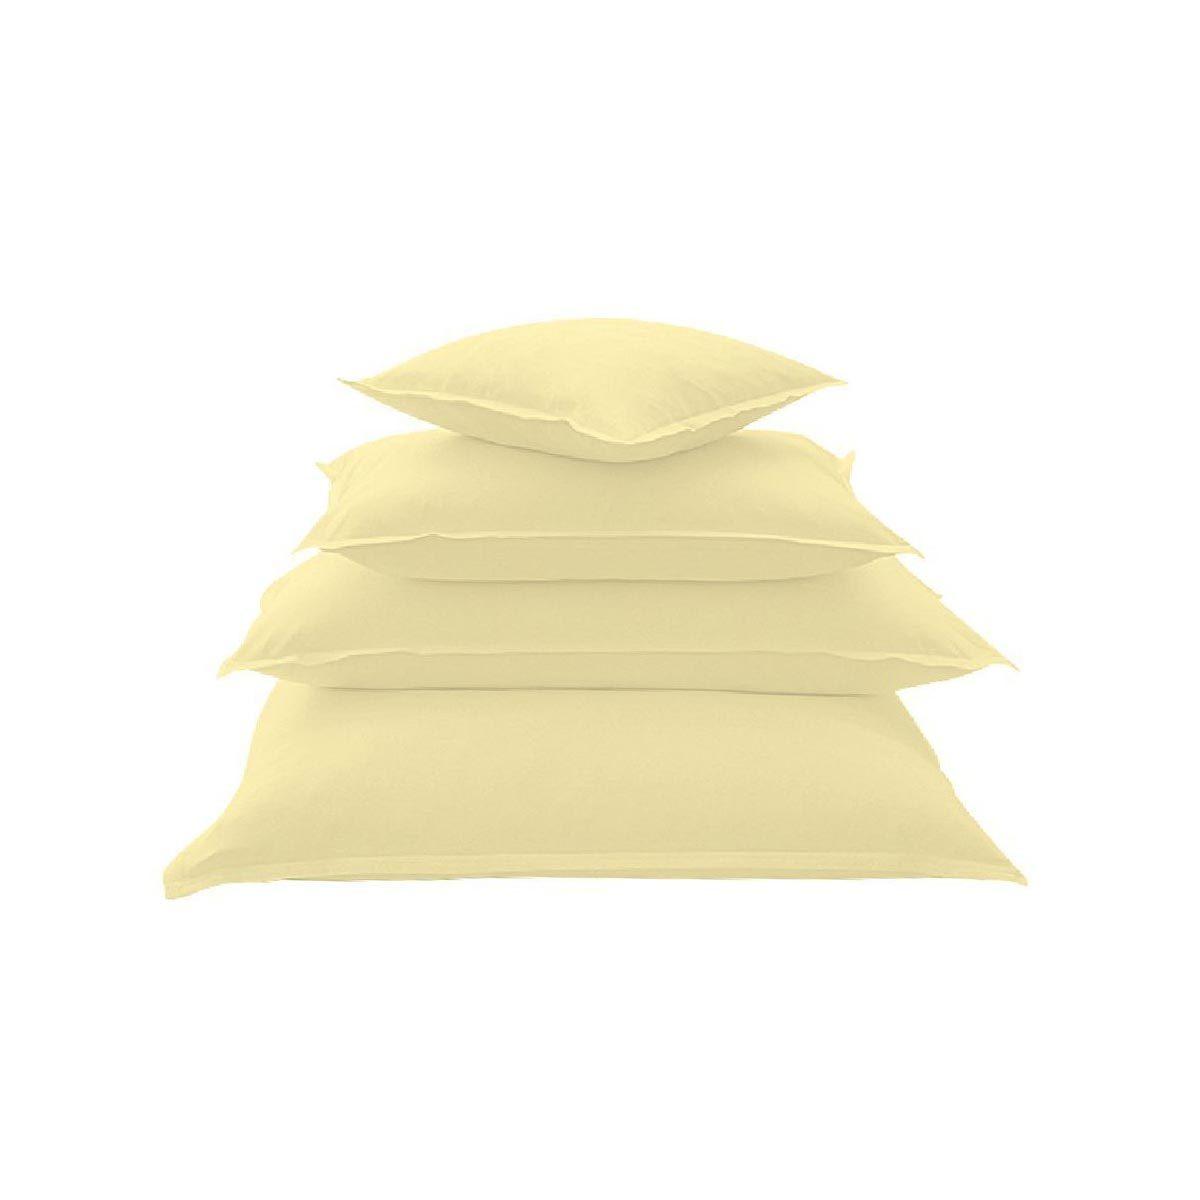 Schlafgut Kissenbezug Jersey Elasthan